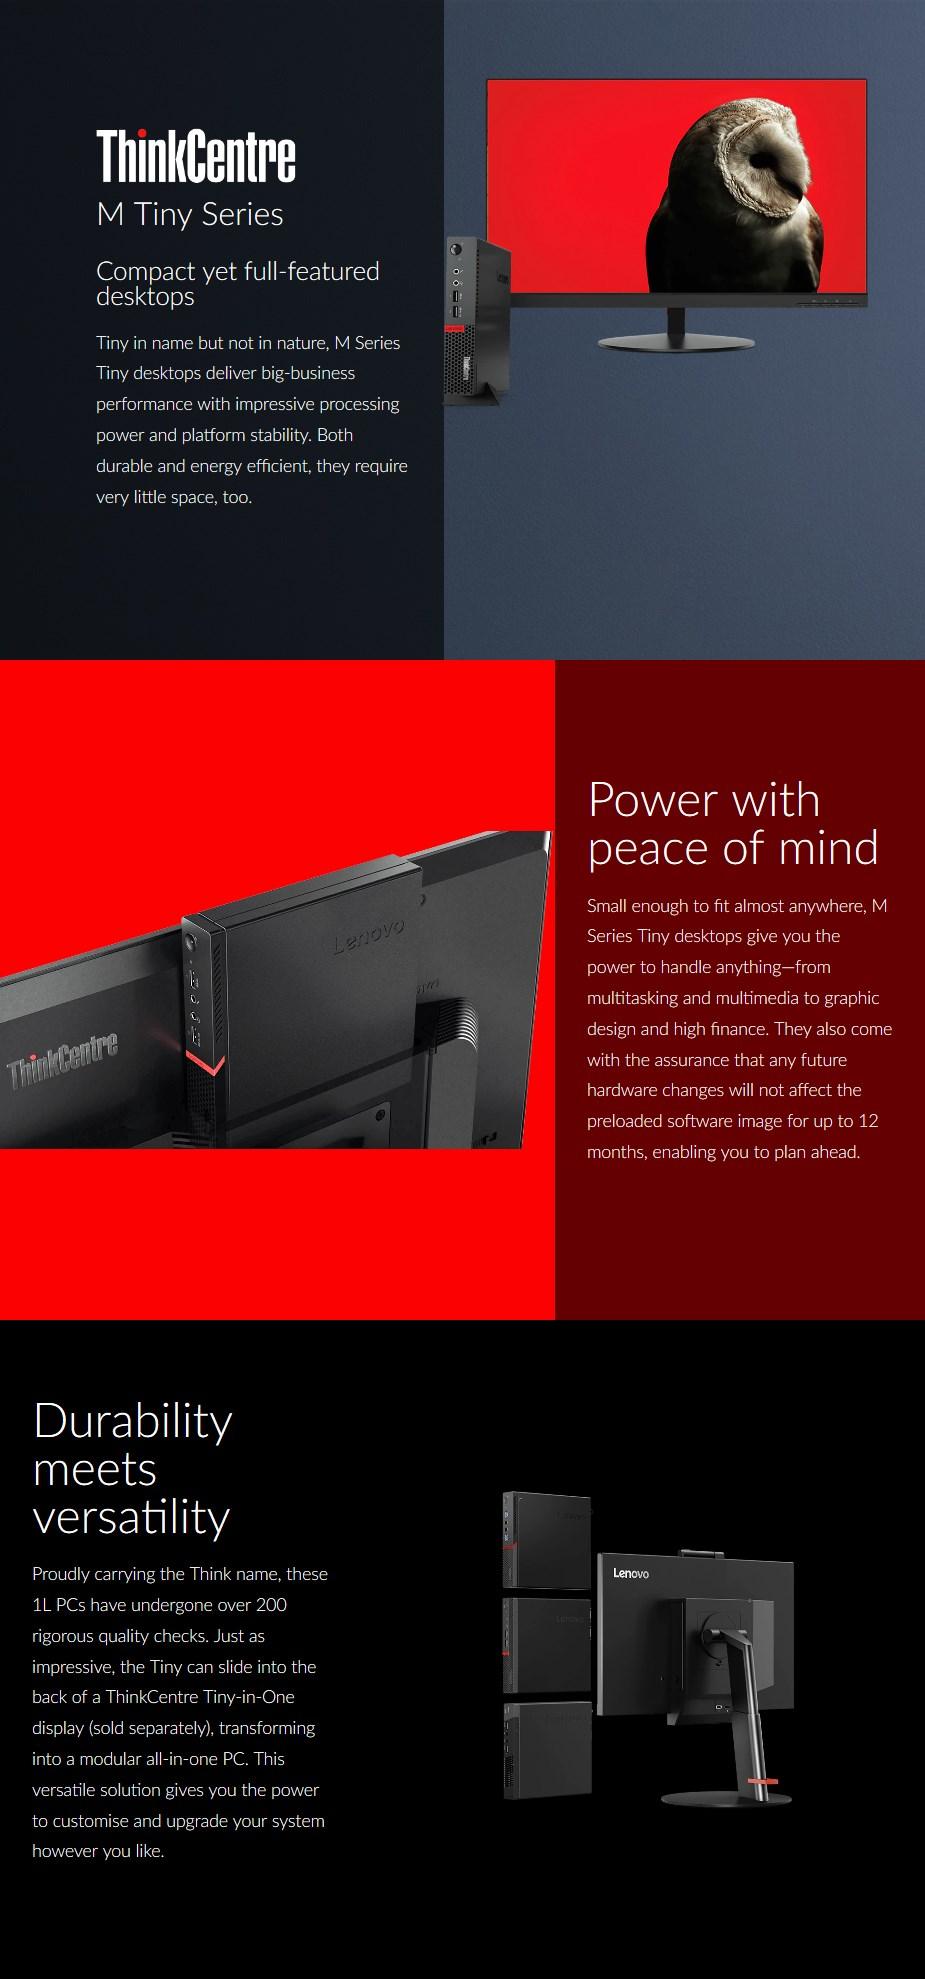 Lenovo ThinkCentre M720Q Tiny PC i7-9700T 8GB 256GB Win10 Pro - Desktop overview 1